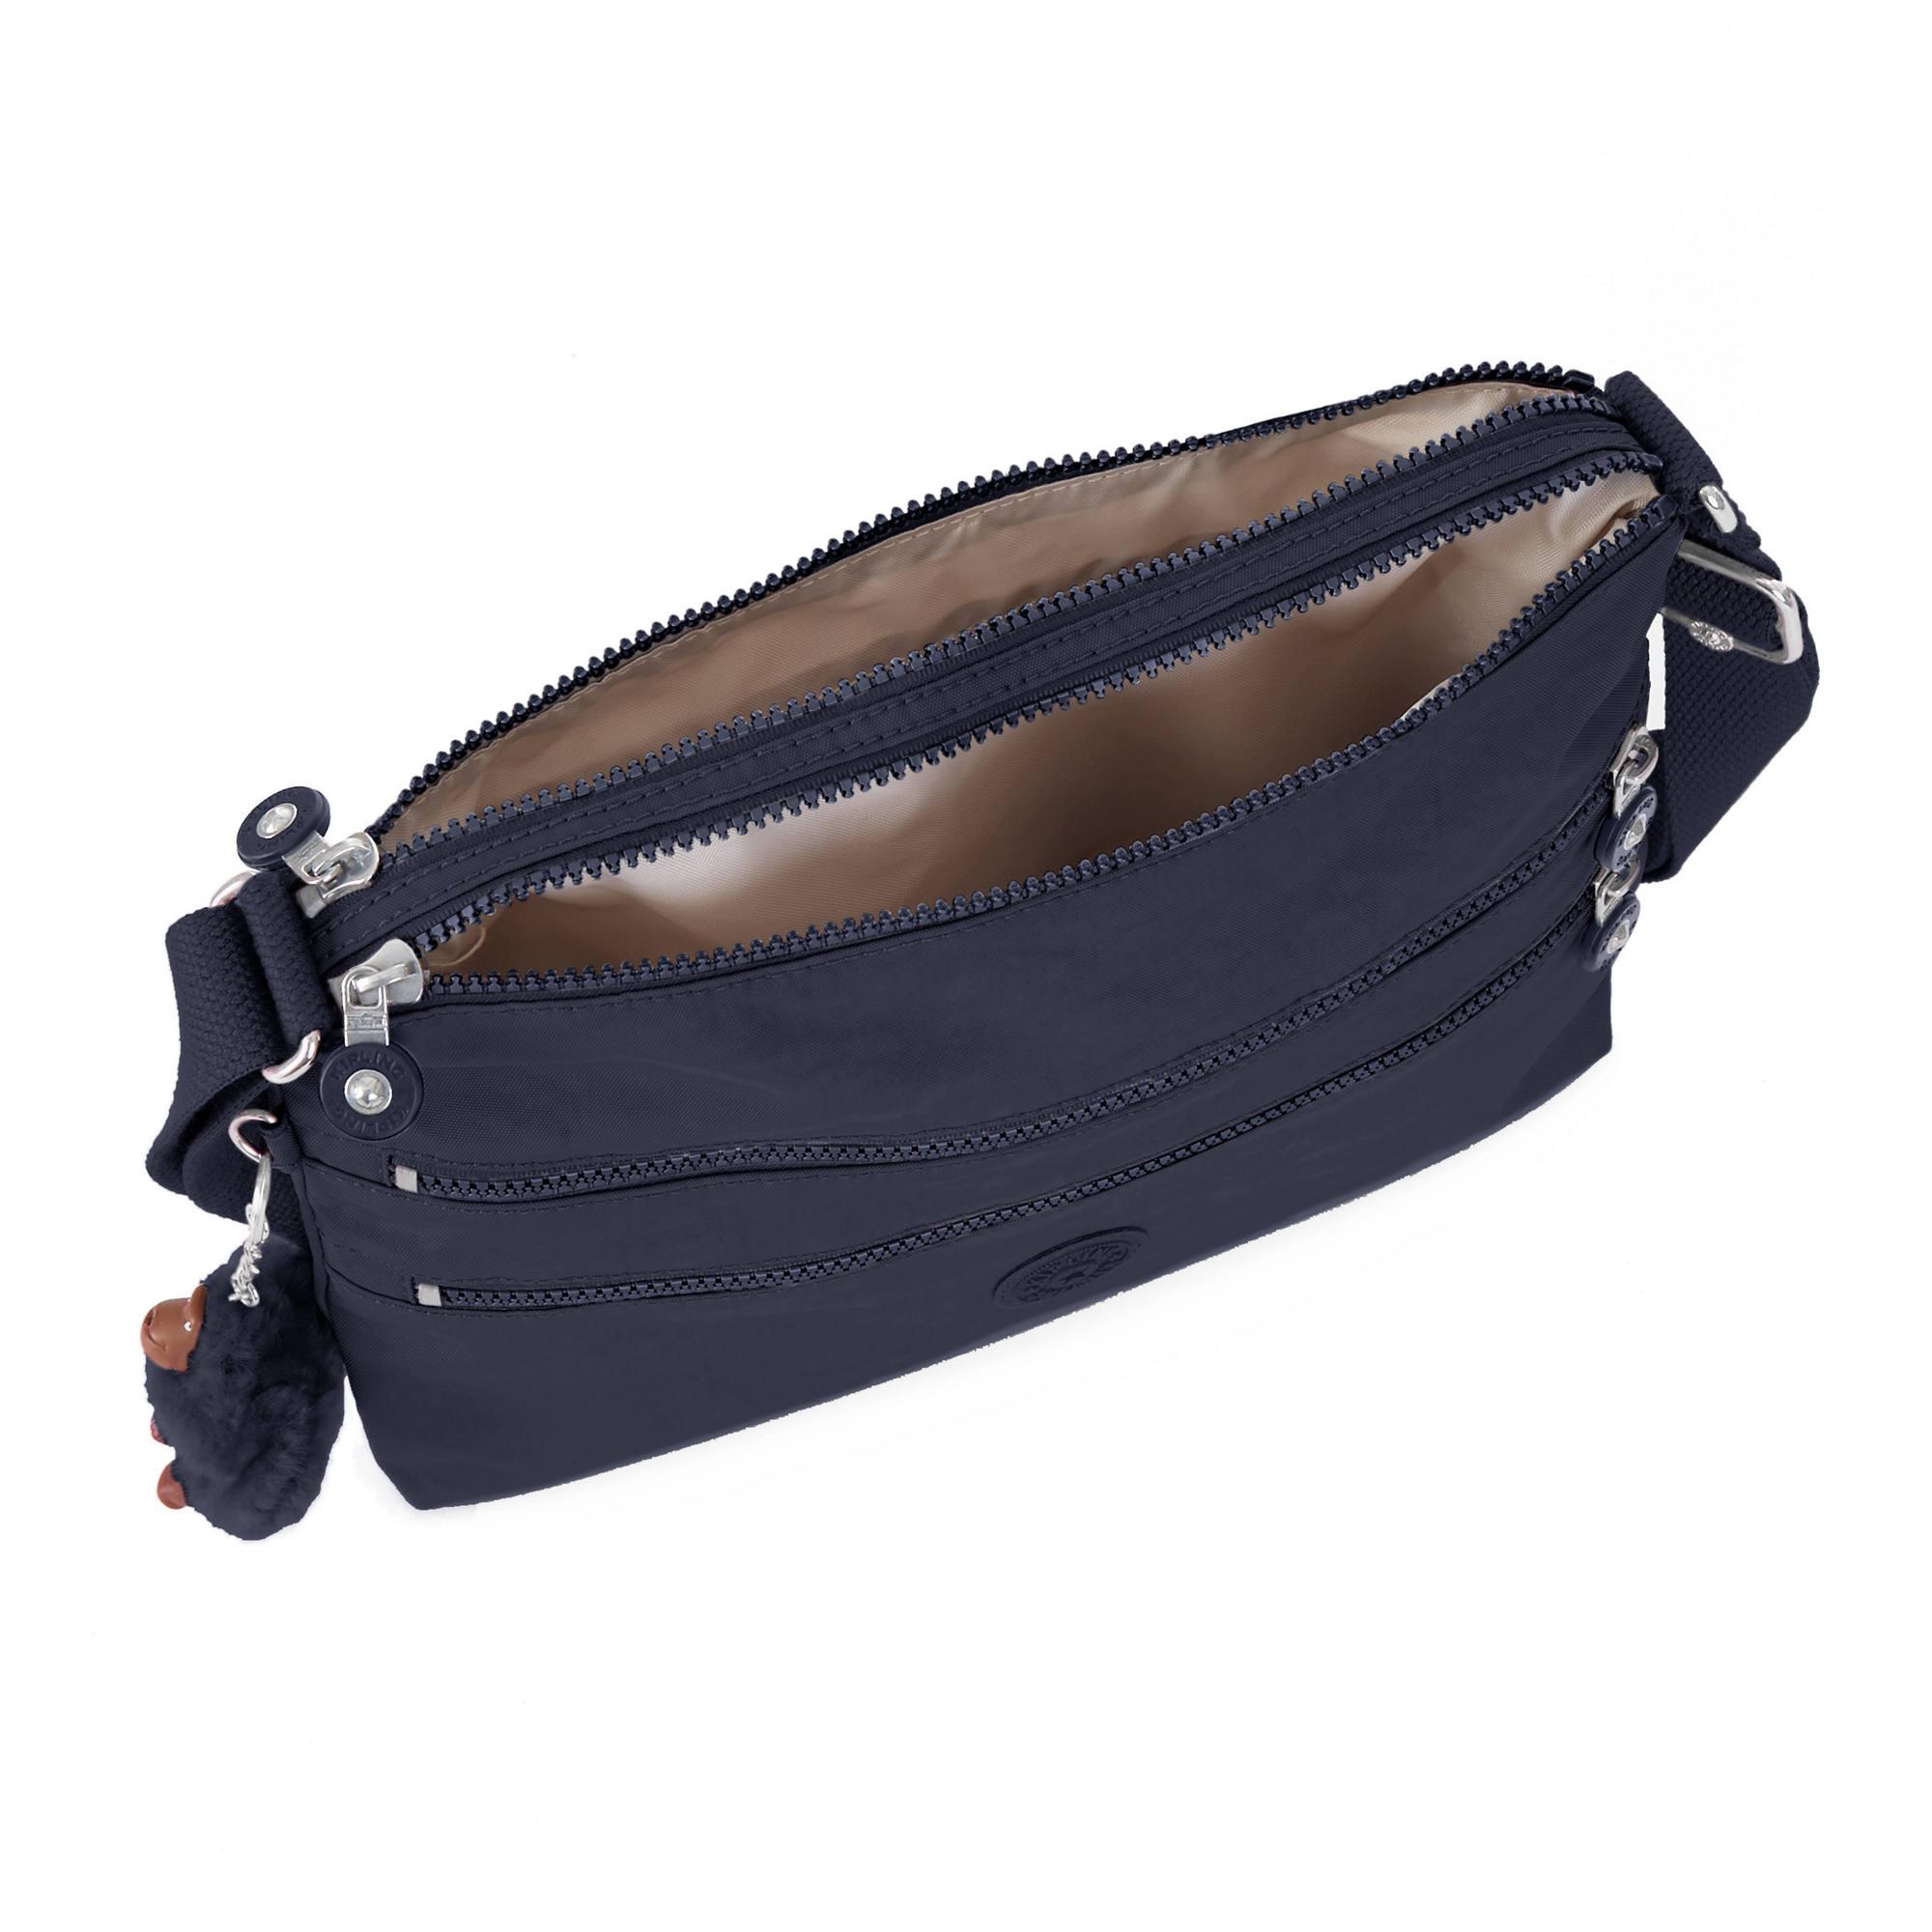 Kipling-Alvar-Metallic-Crossbody-Bag miniature 50